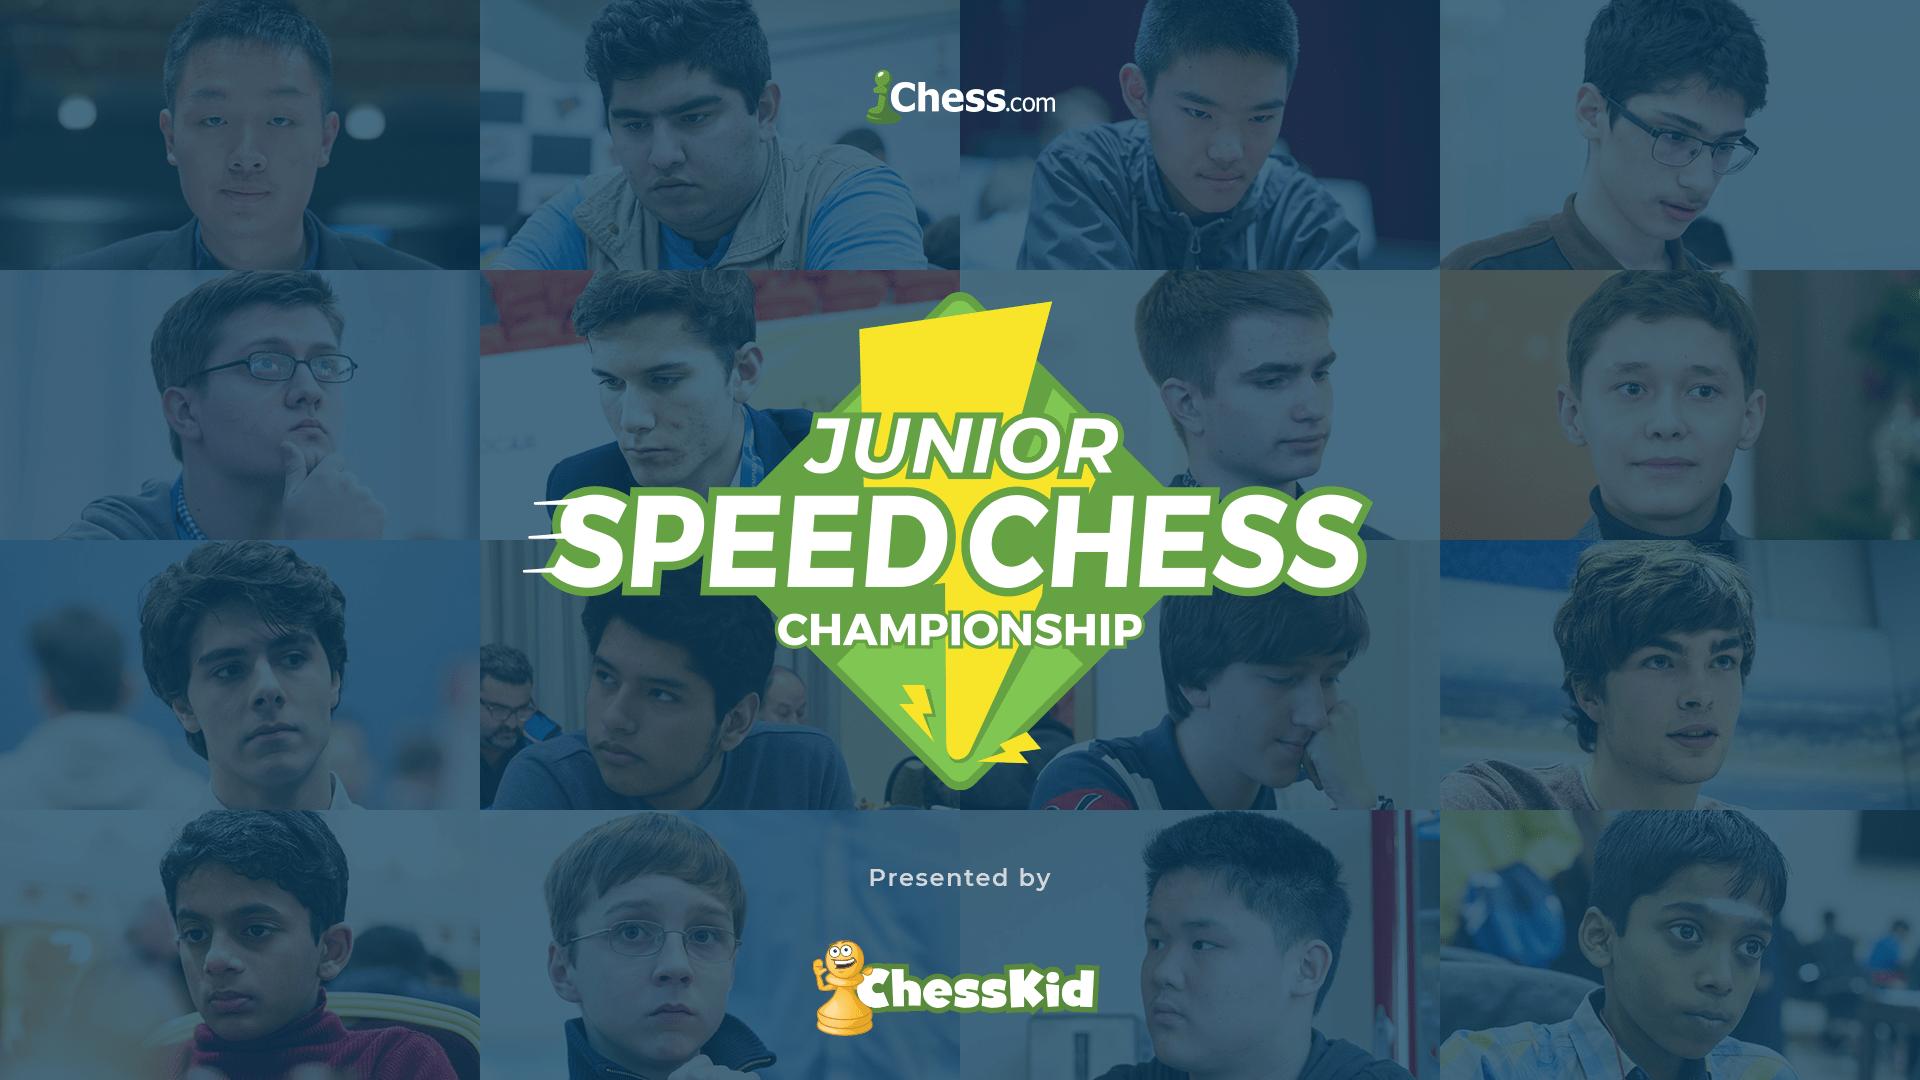 junior speed chess championship chesskid